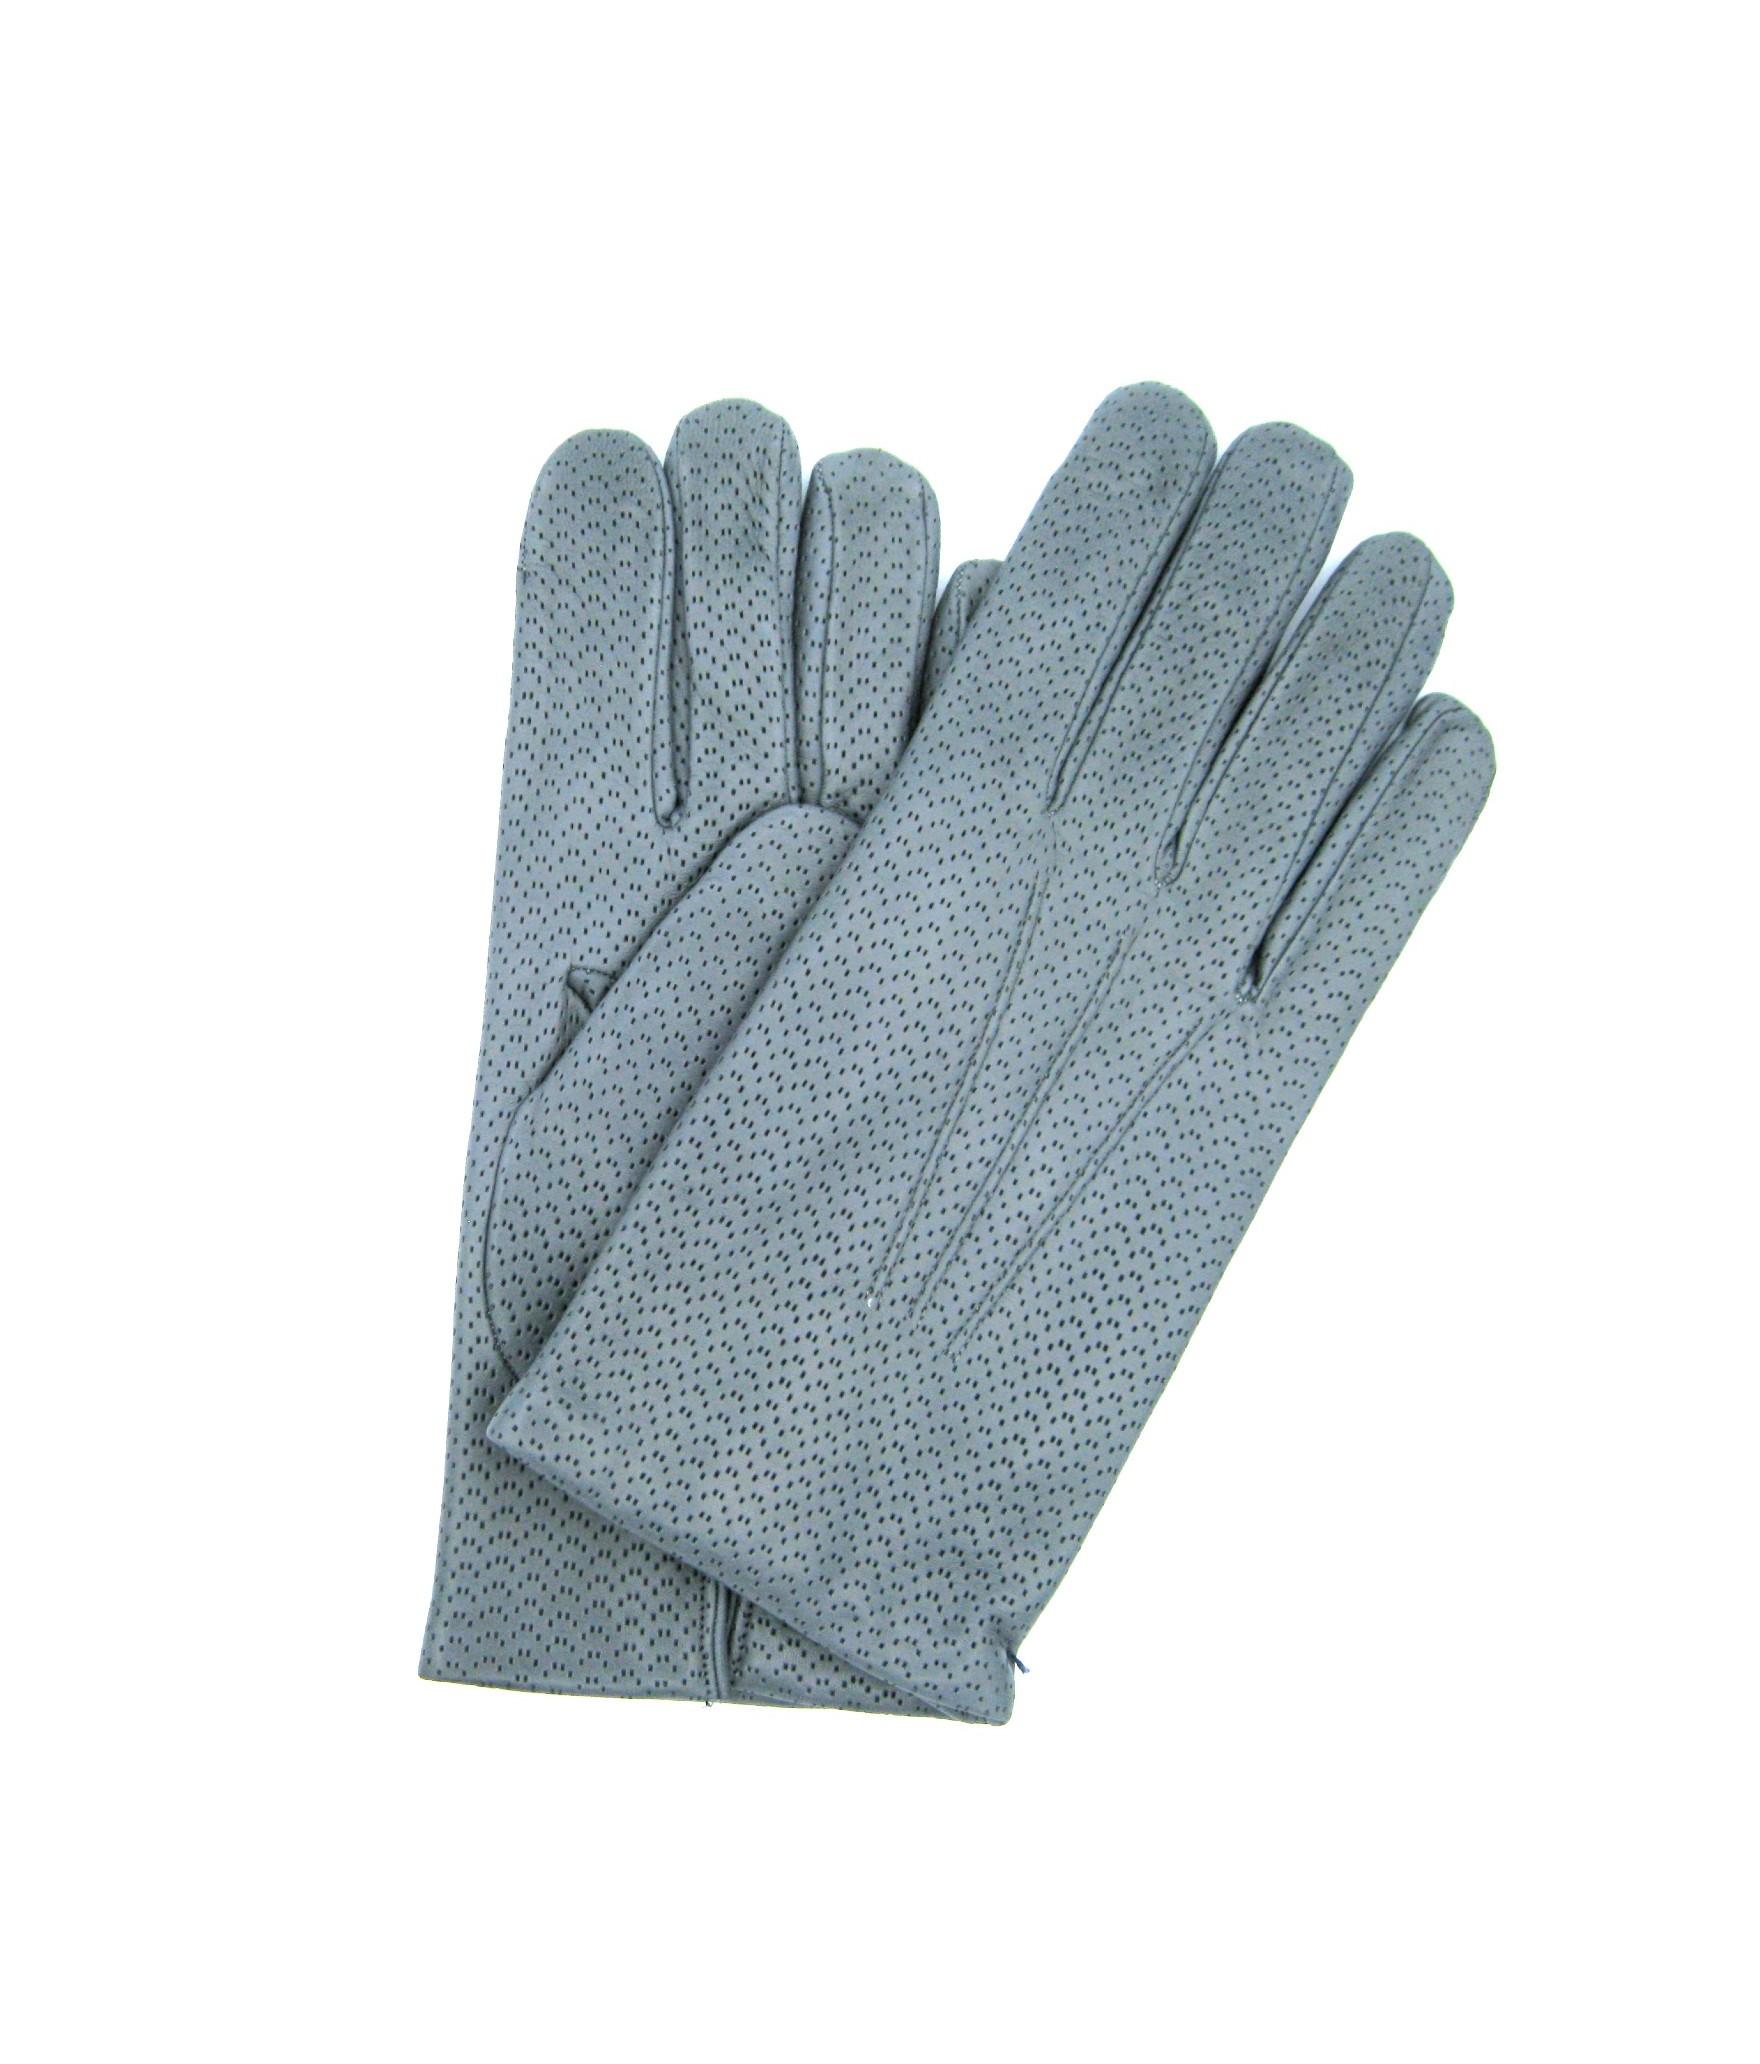 Nappa leather gloves 2bt,cashmere lined Grey Sermoneta Gloves